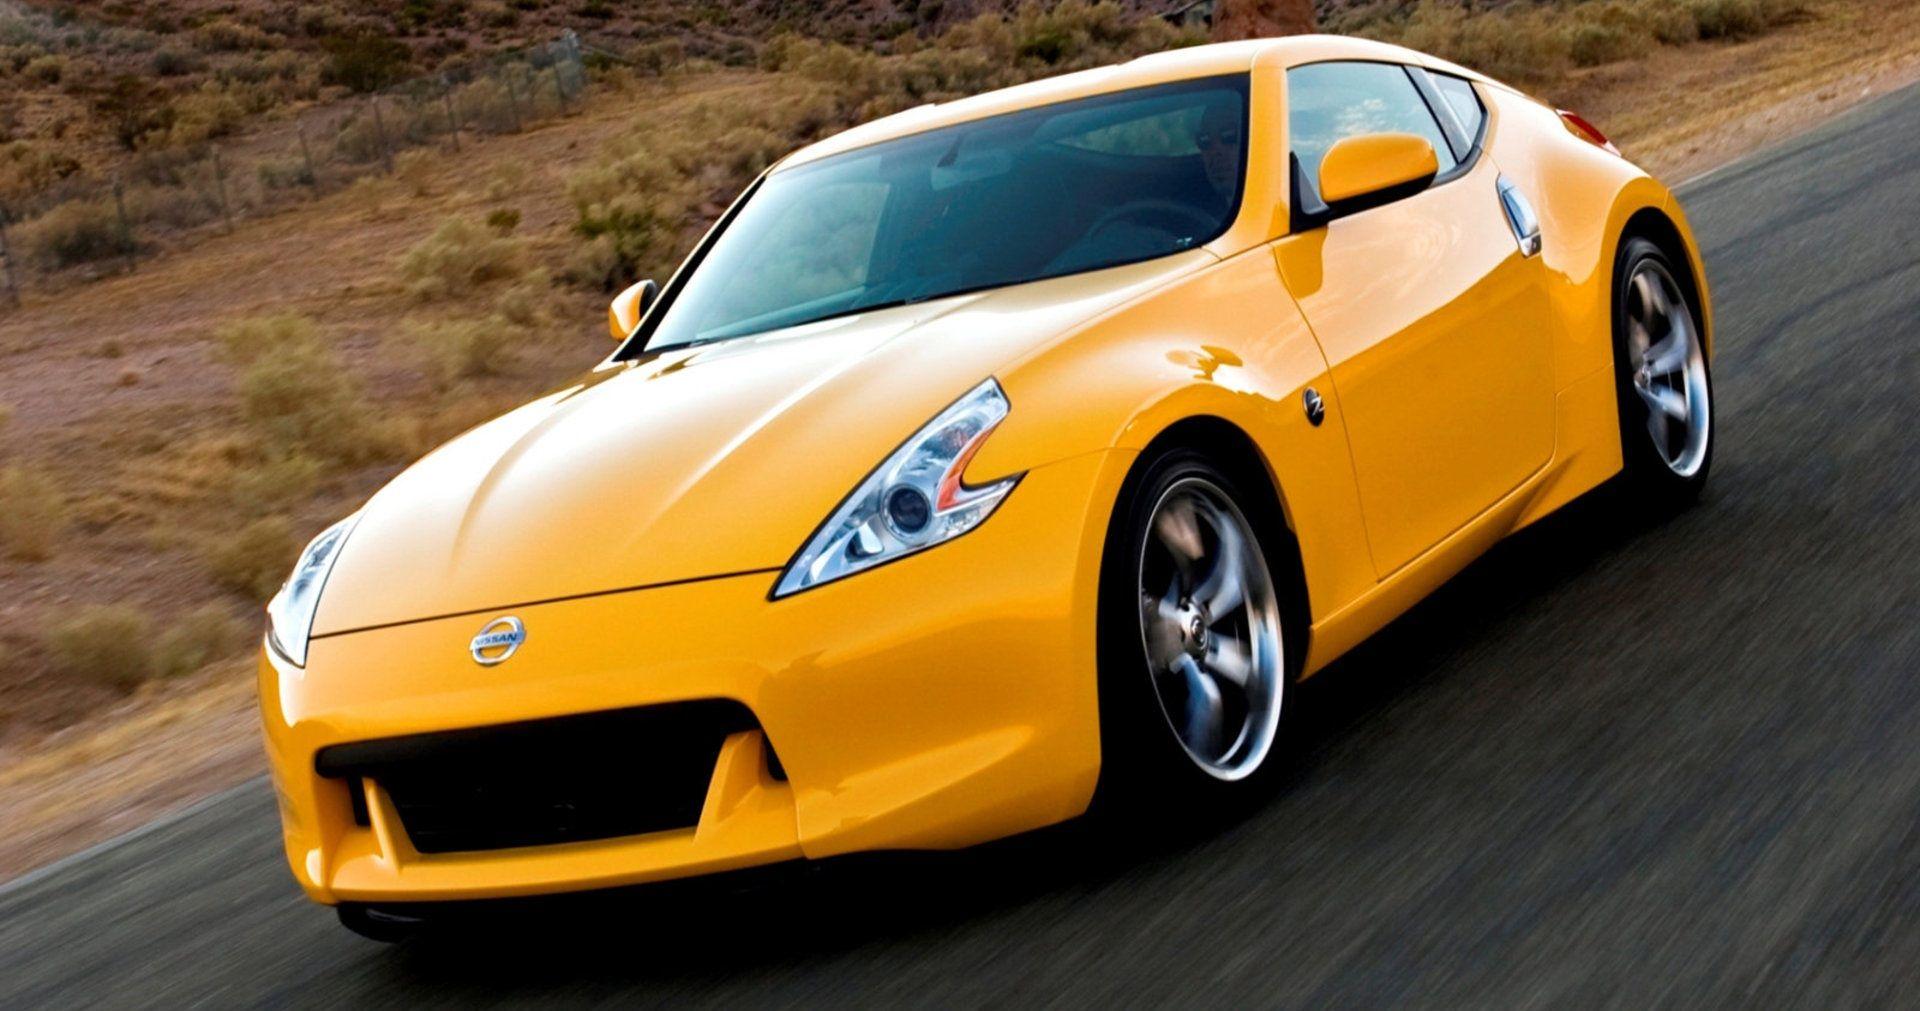 Yellow Nissan 370Z Nismo Nissan Pinterest